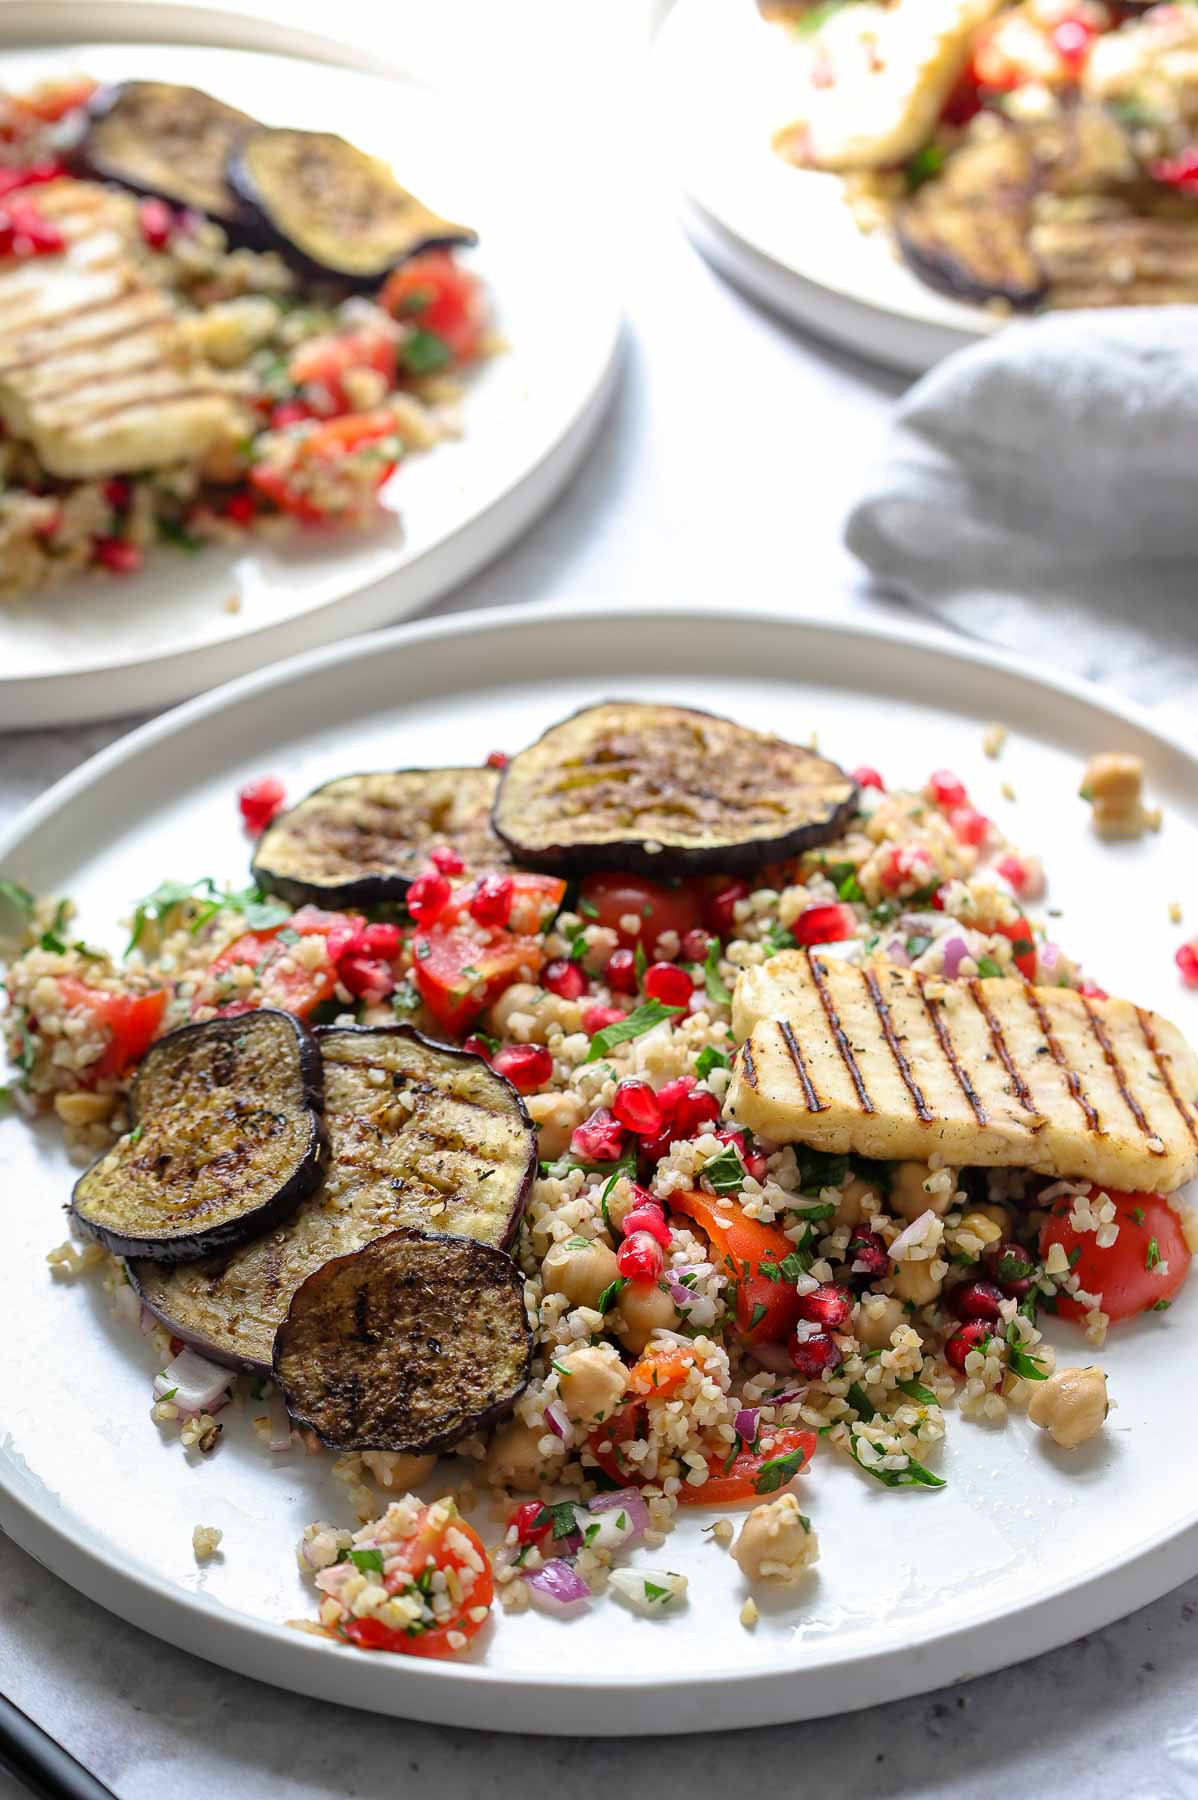 Bulgur Chickpea Salad with Grilled Halloumi and Eggplant/Aubergine